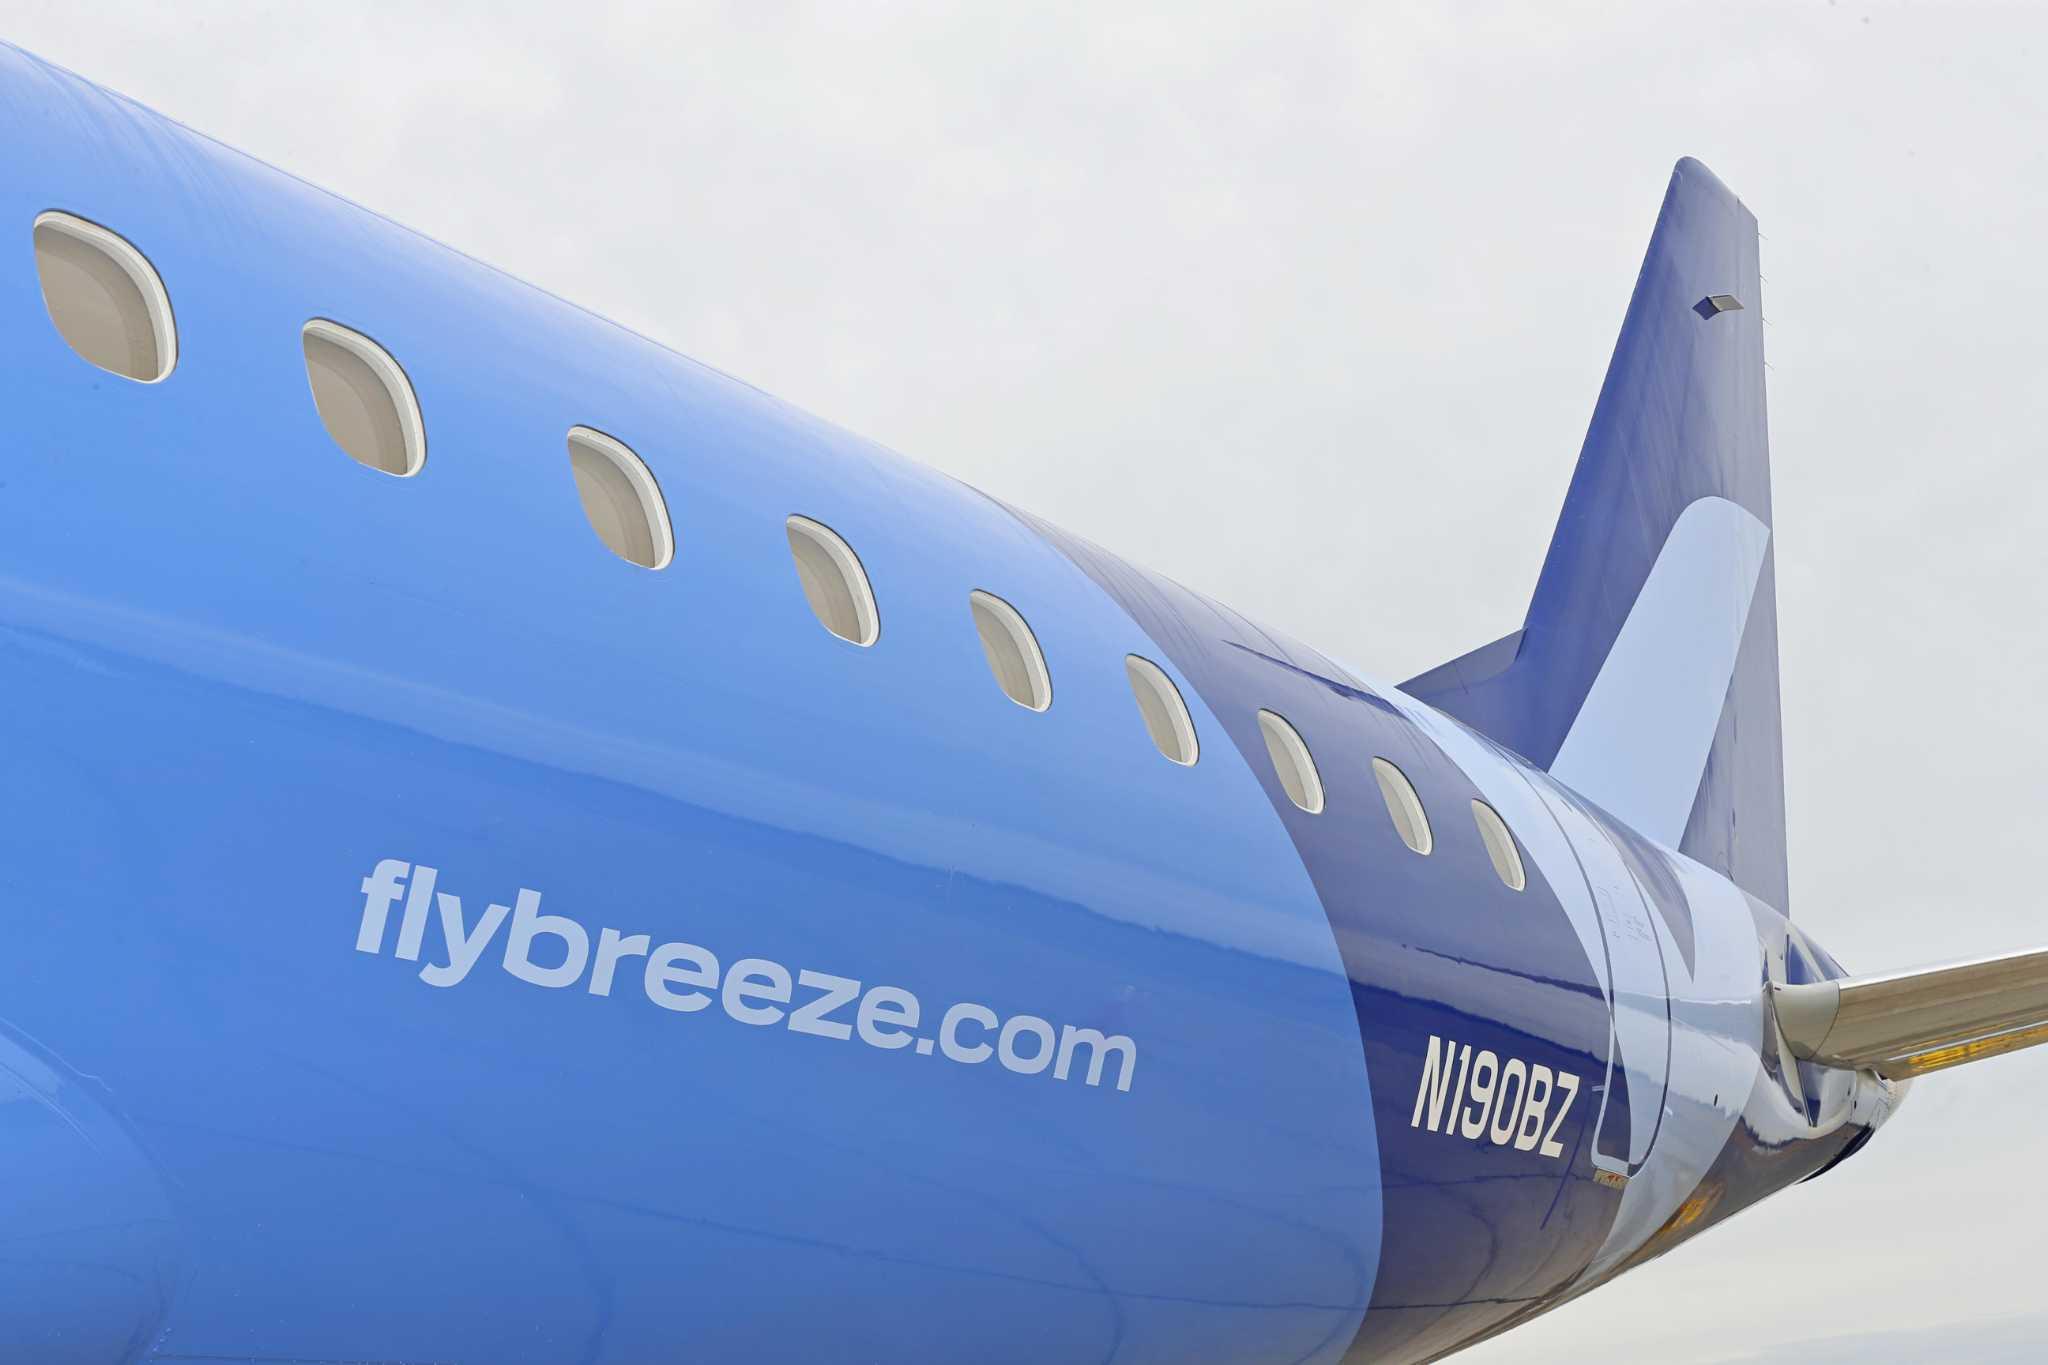 New Breeze Airways eyes flights from Bridgeport's Sikorsky